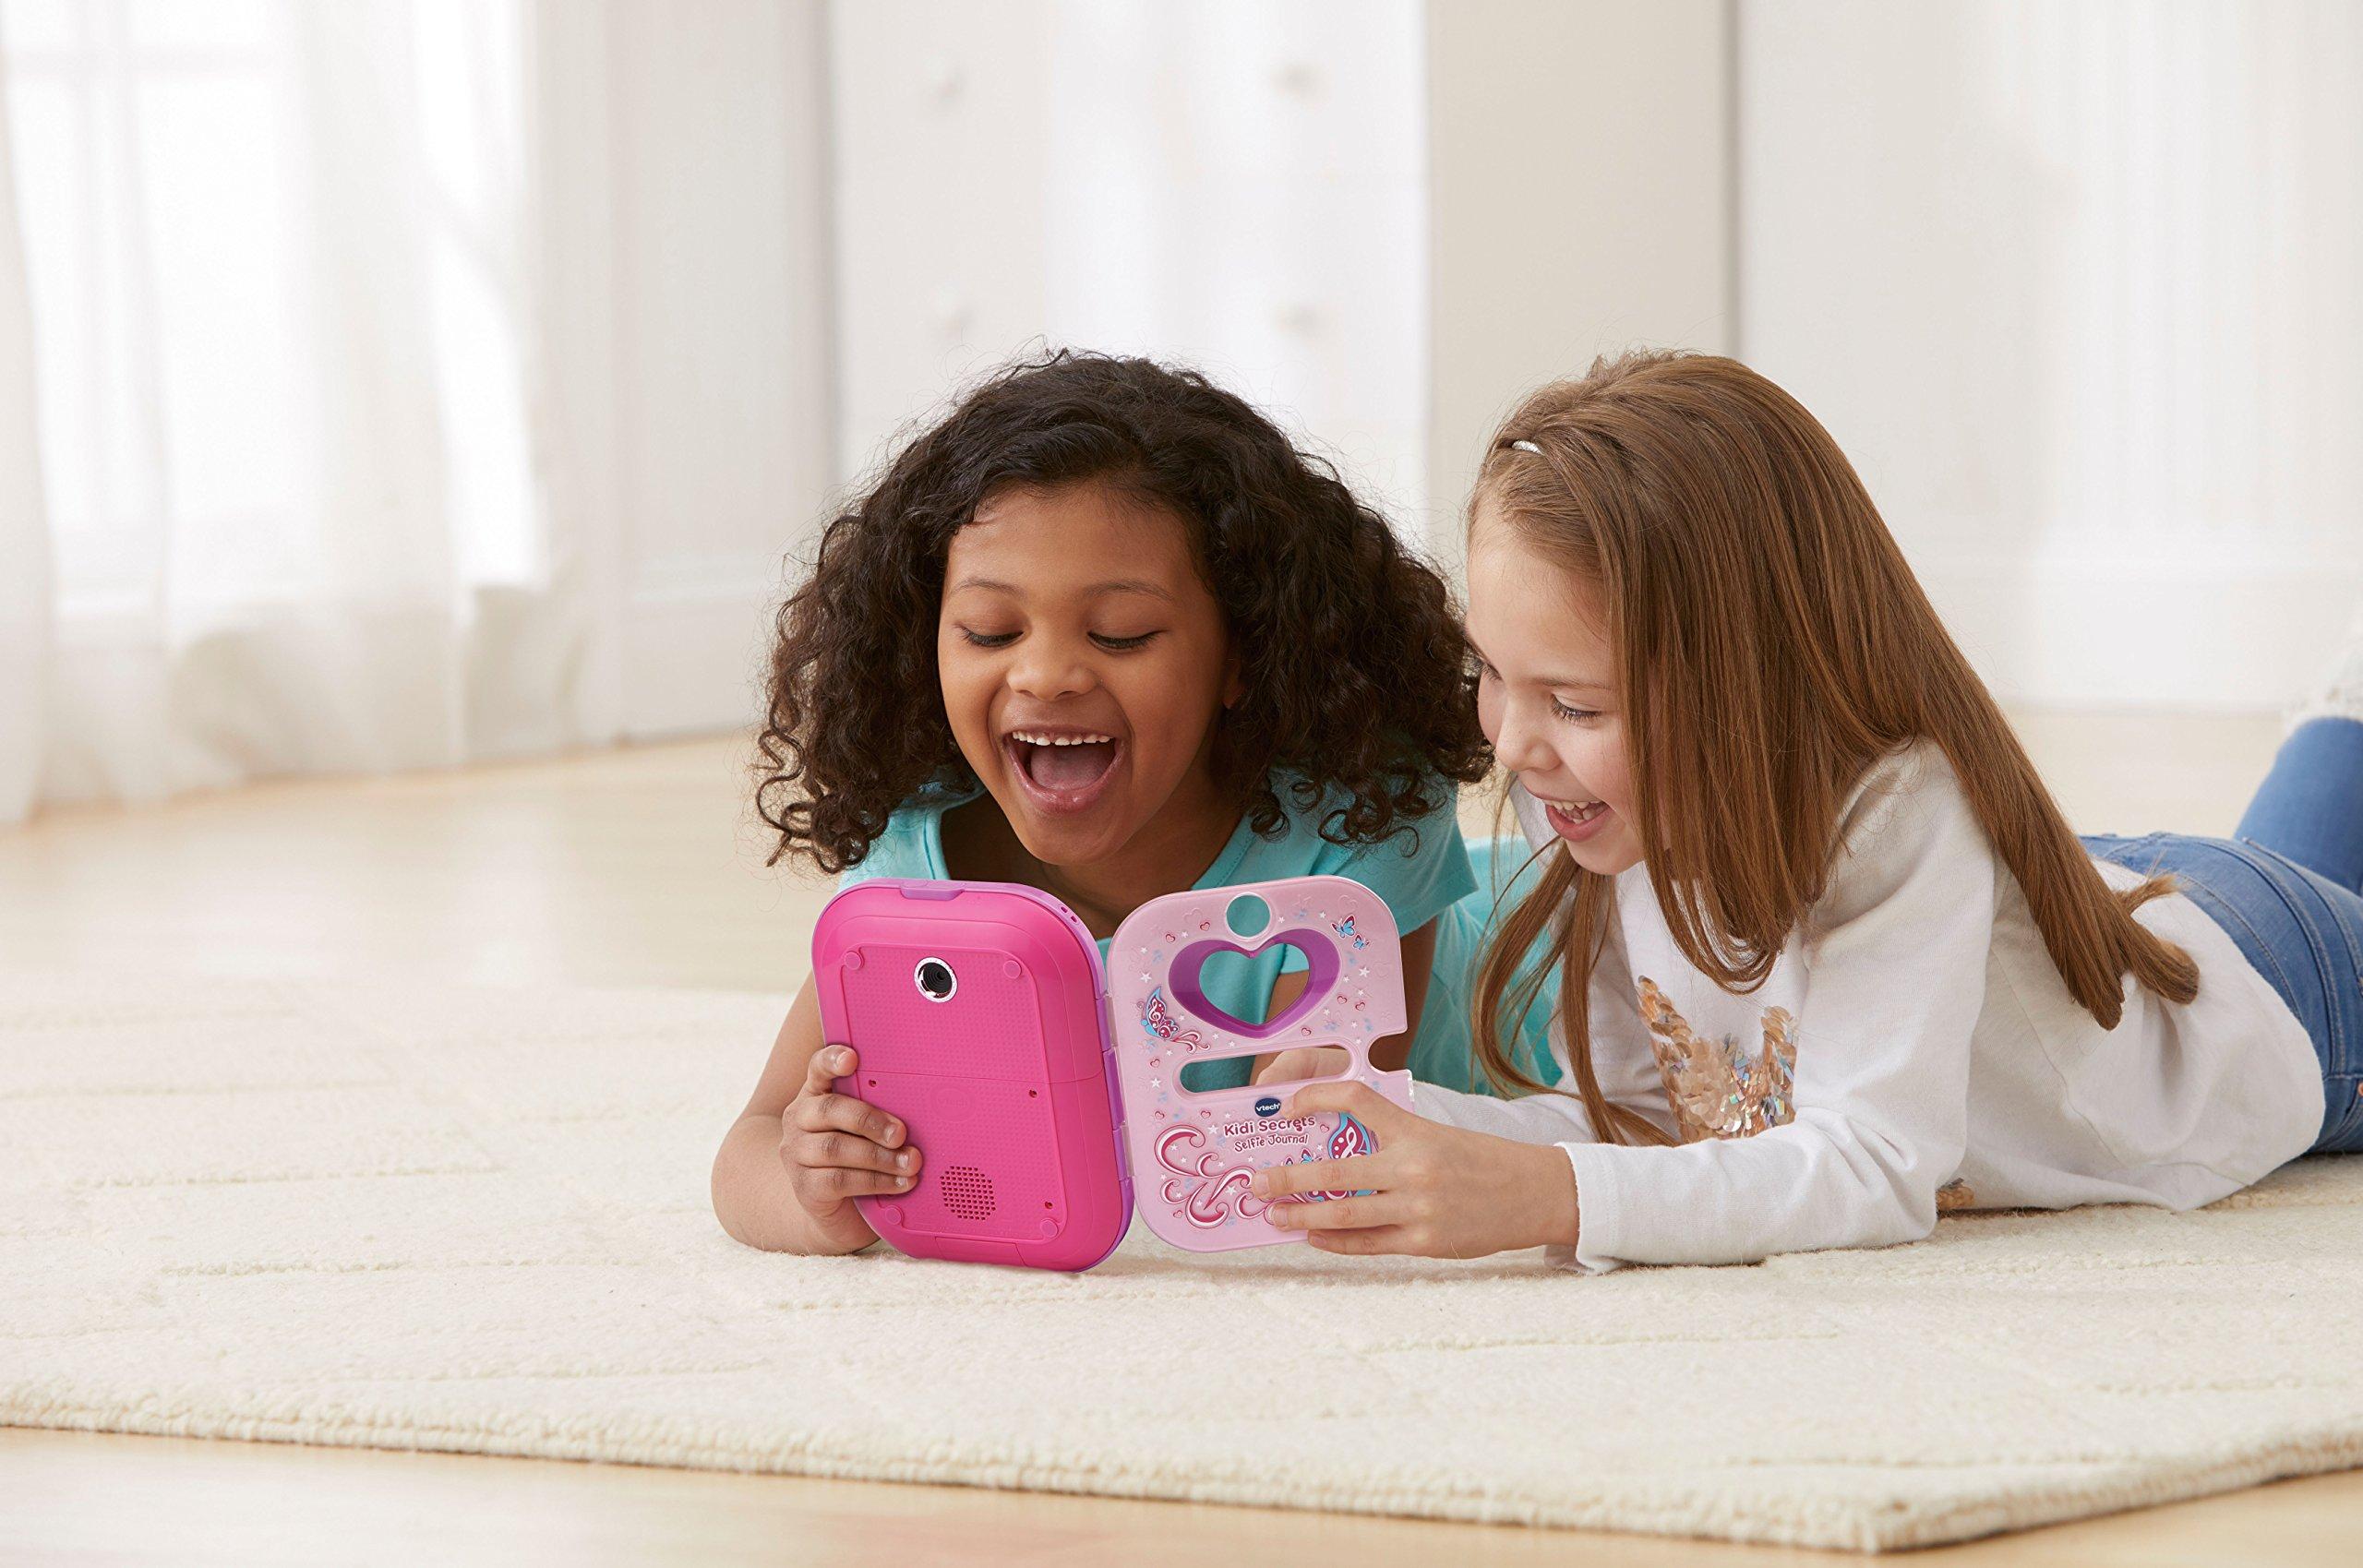 VTech Kidi Secrets Selfie Journal with Face Identifier, Pink by VTech (Image #5)